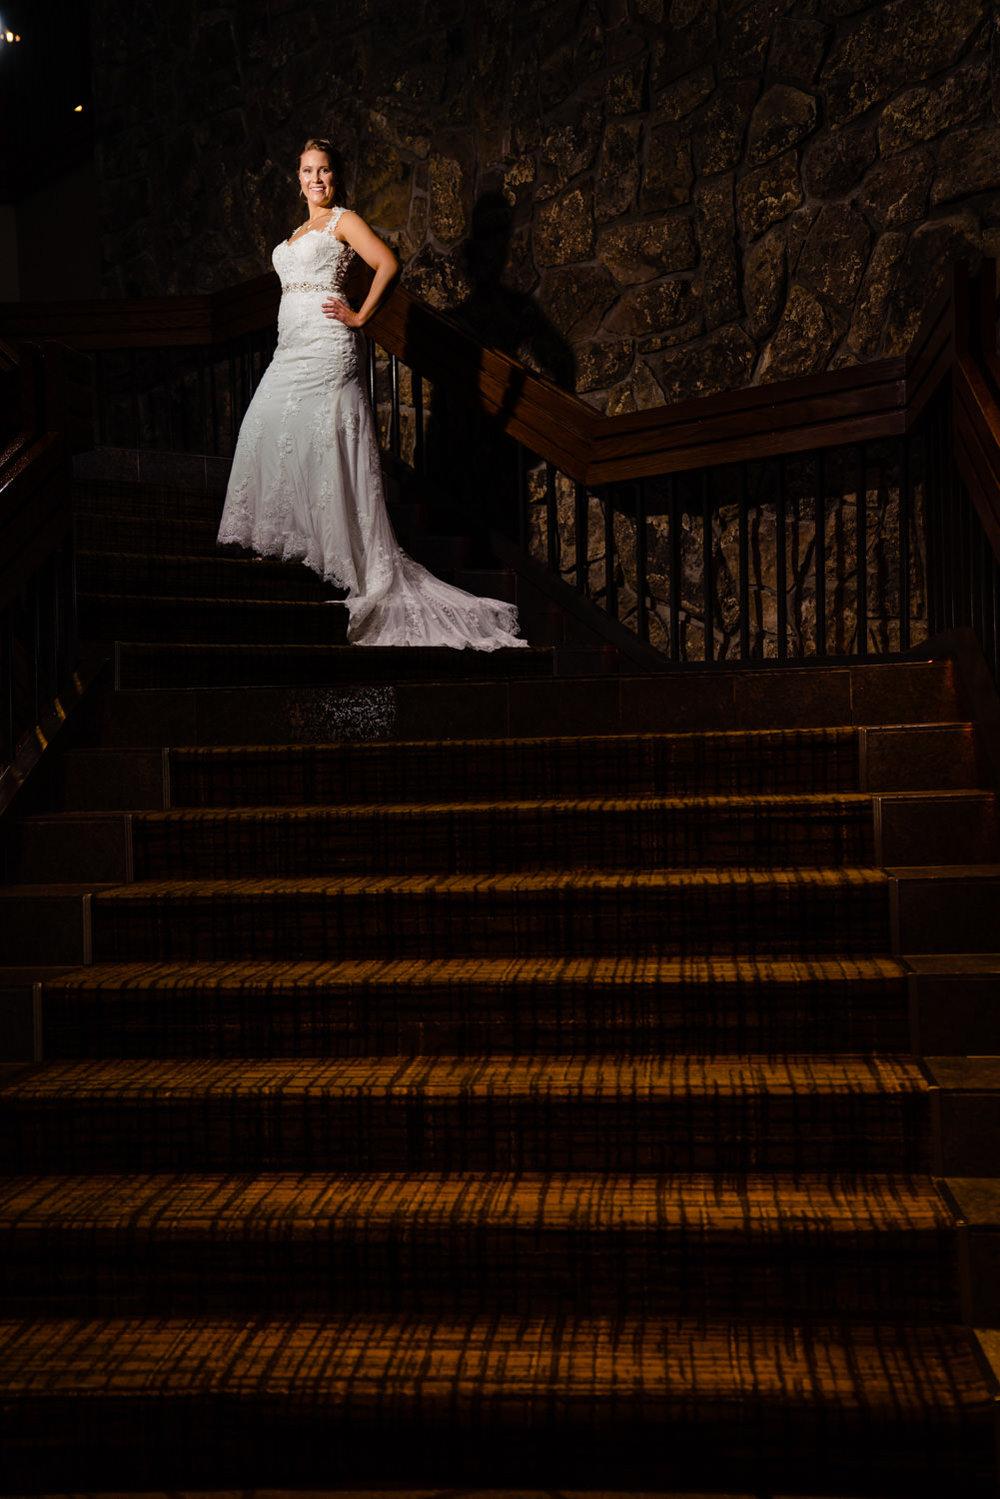 Cheyenne Mountain Resort Wedding by Colorado Spring Wedding Photographer JMGant Photography.